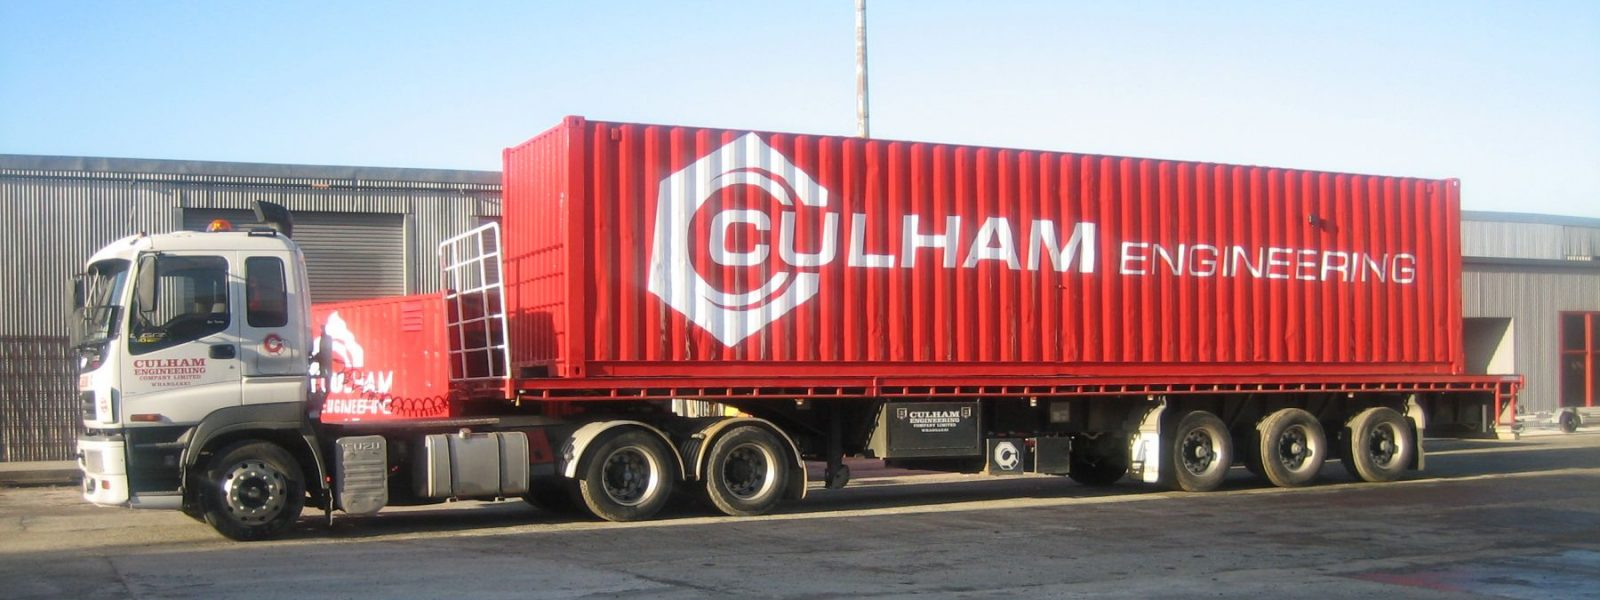 Heavy Haulage Trucks